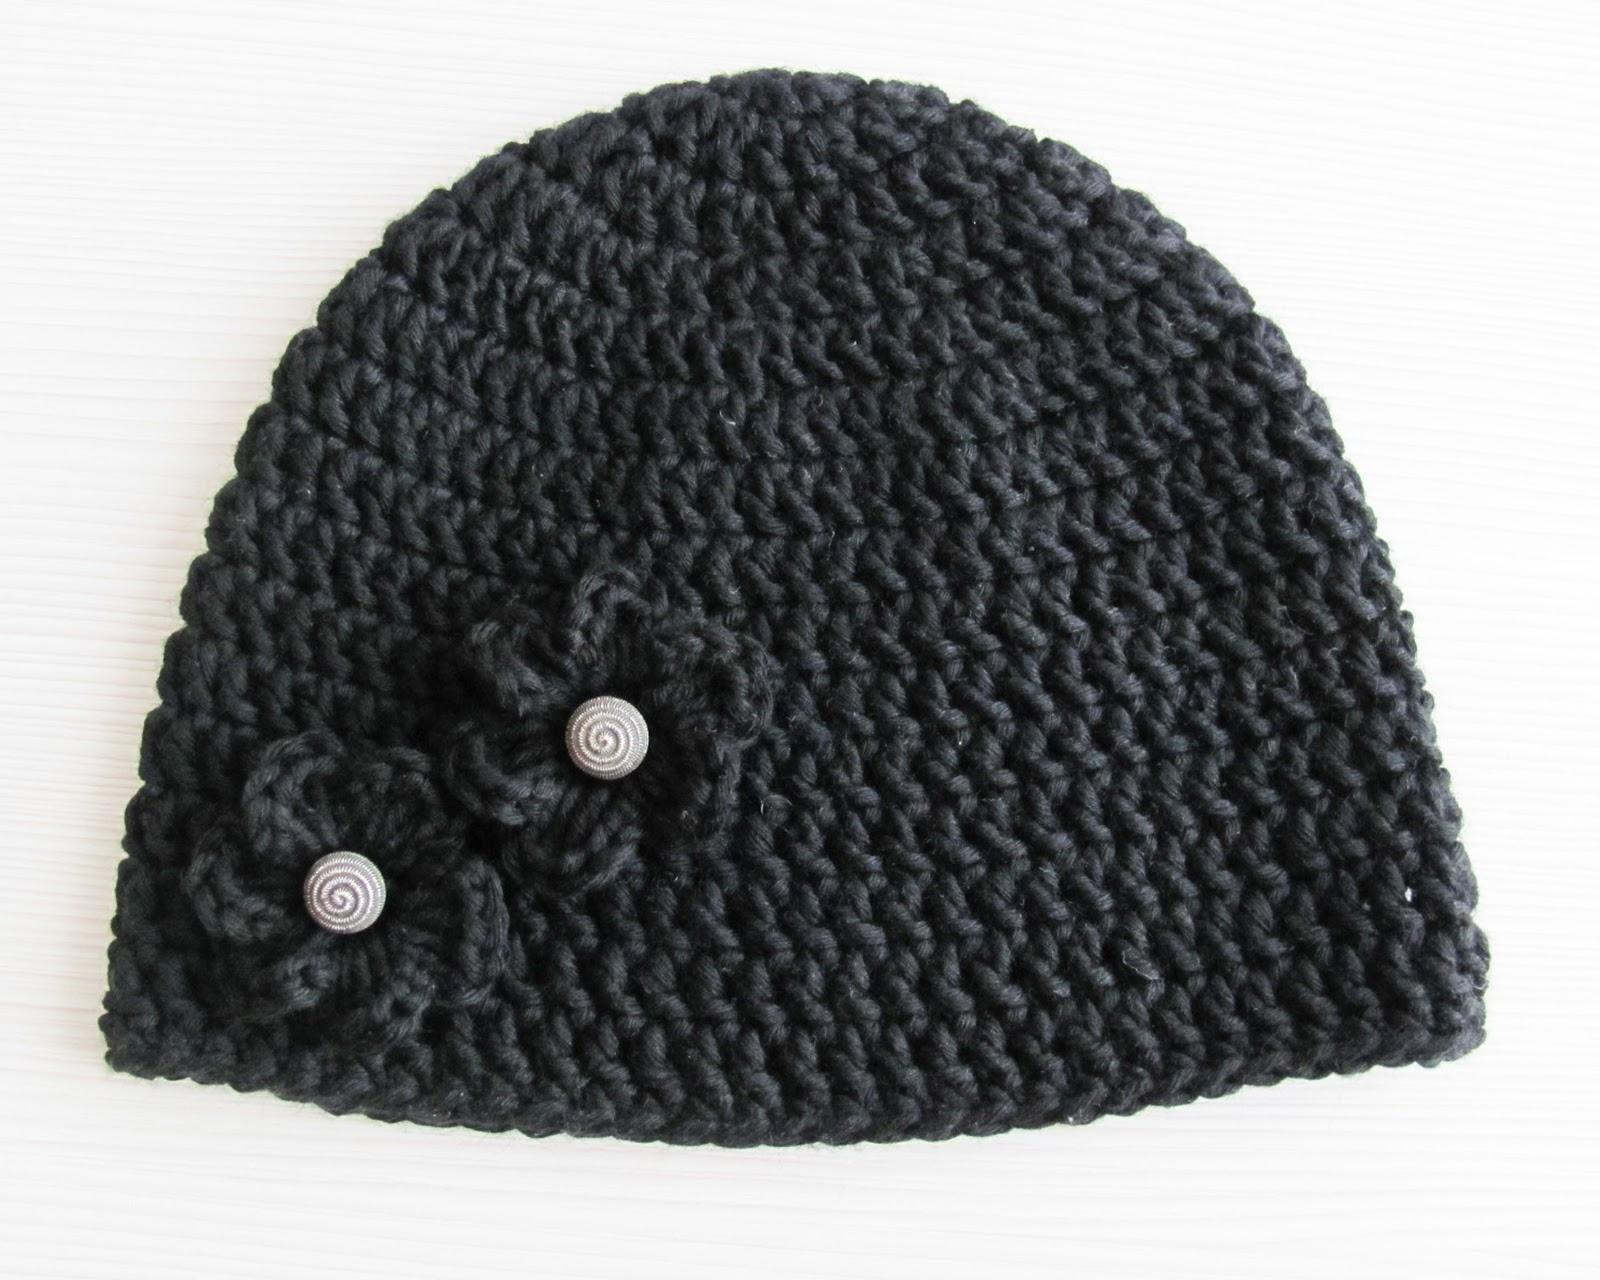 Crochet Beanie Pattern Basic : Linas Land: Embellished Basic Crochet Beanie